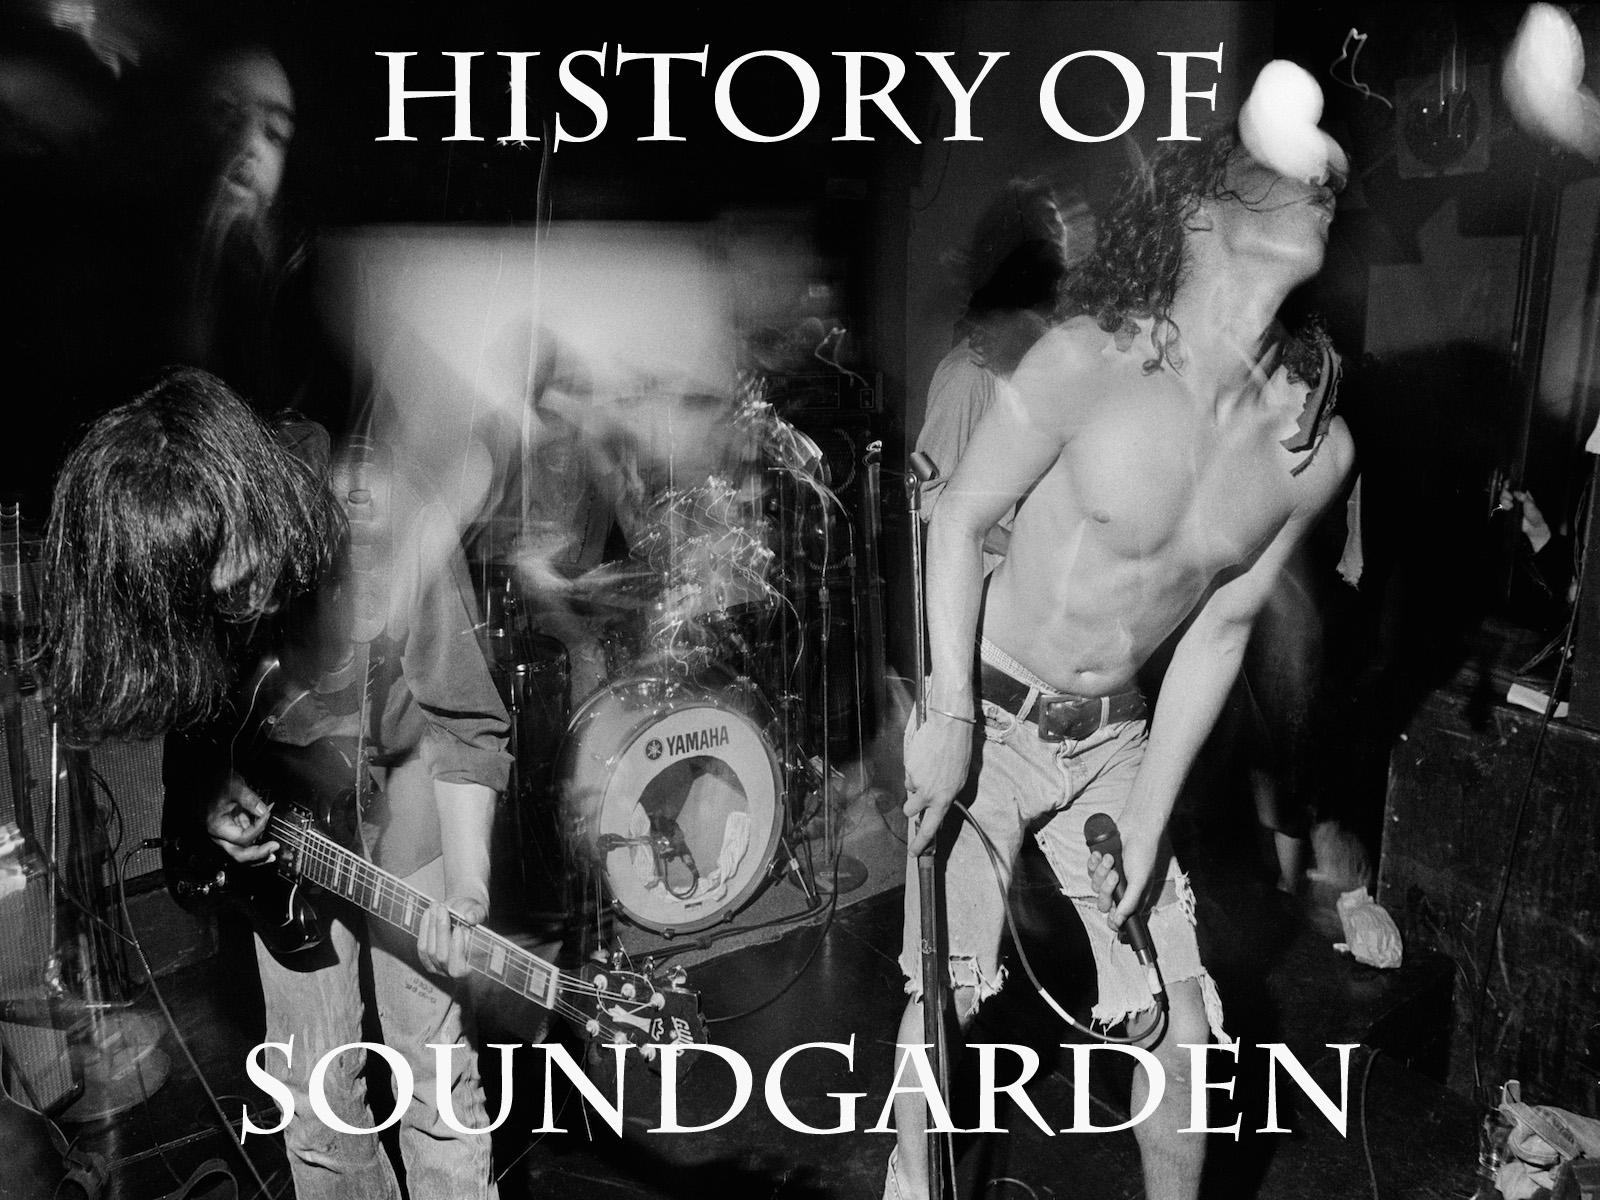 HISTORY OF SOUNDGARDEN